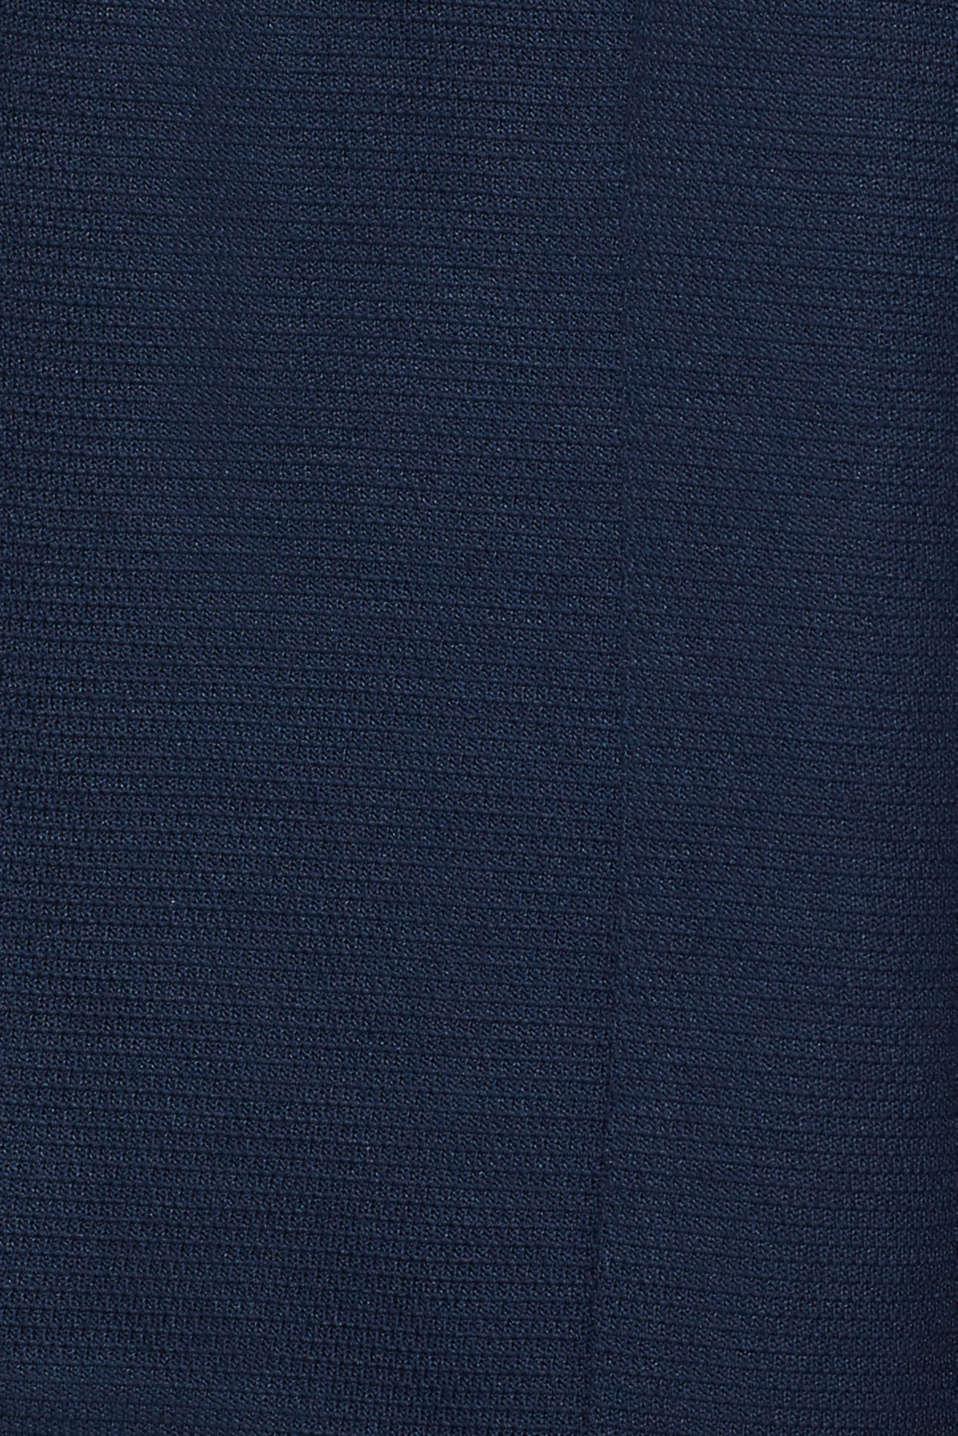 Bolero cardigan made of textured jersey, NAVY, detail image number 2